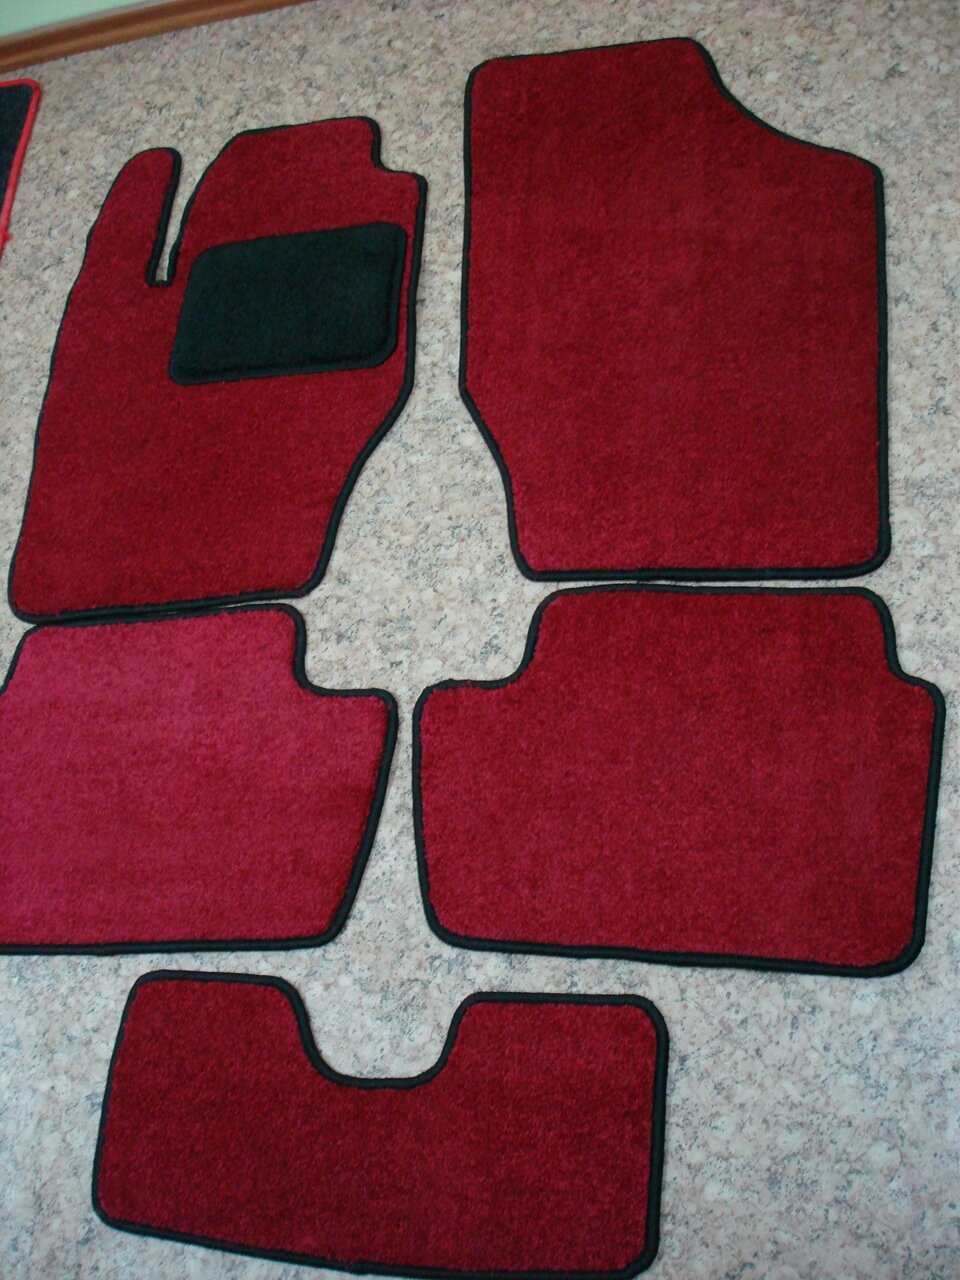 салонные коврики Great Wall Wingle, NOVLINE, Norplast